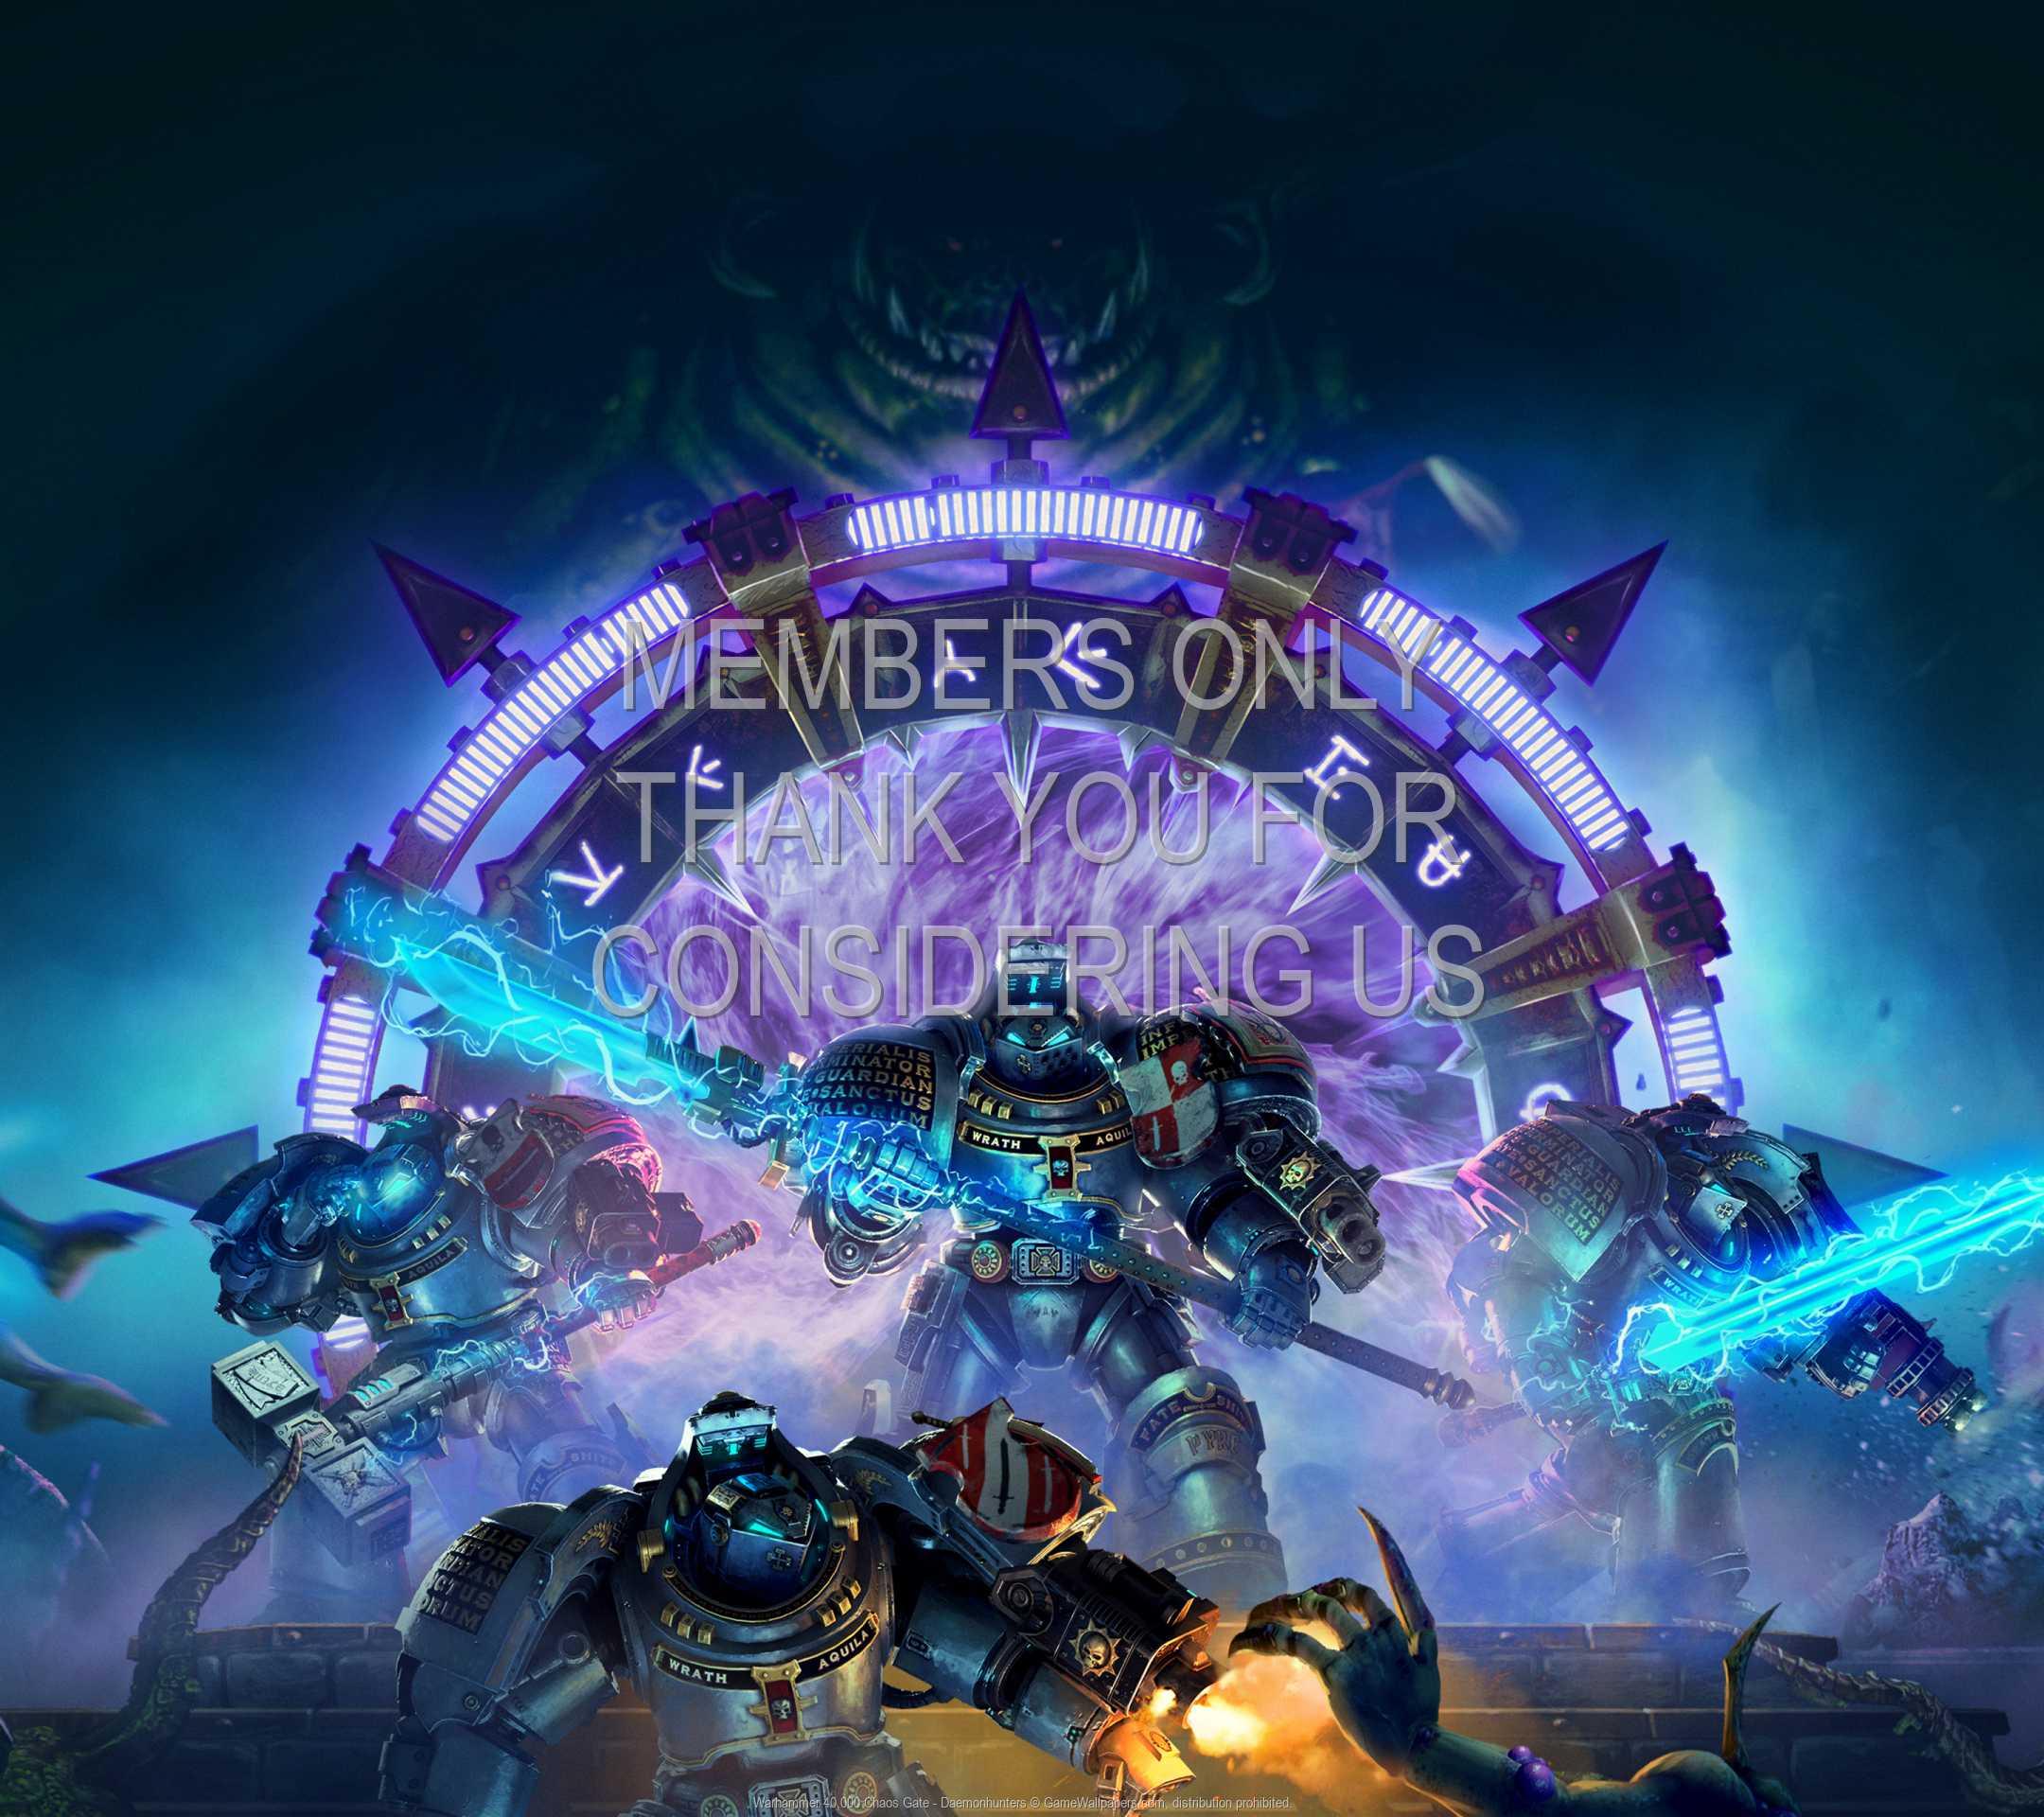 Warhammer 40,000: Chaos Gate - Daemonhunters 1080p Horizontal Móvil fondo de escritorio 01